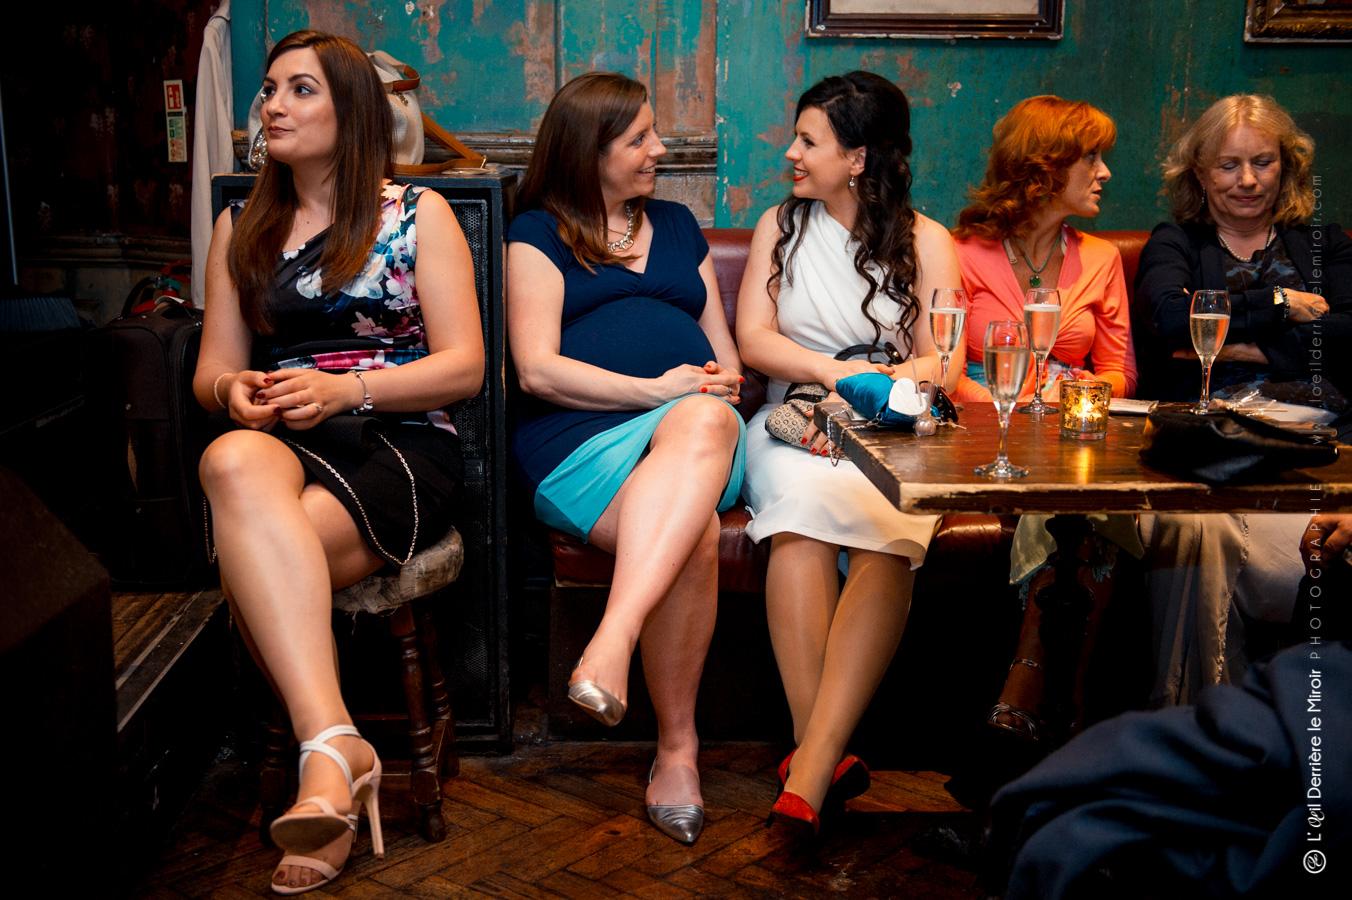 Destination-wedding-photographer-london-AG-069